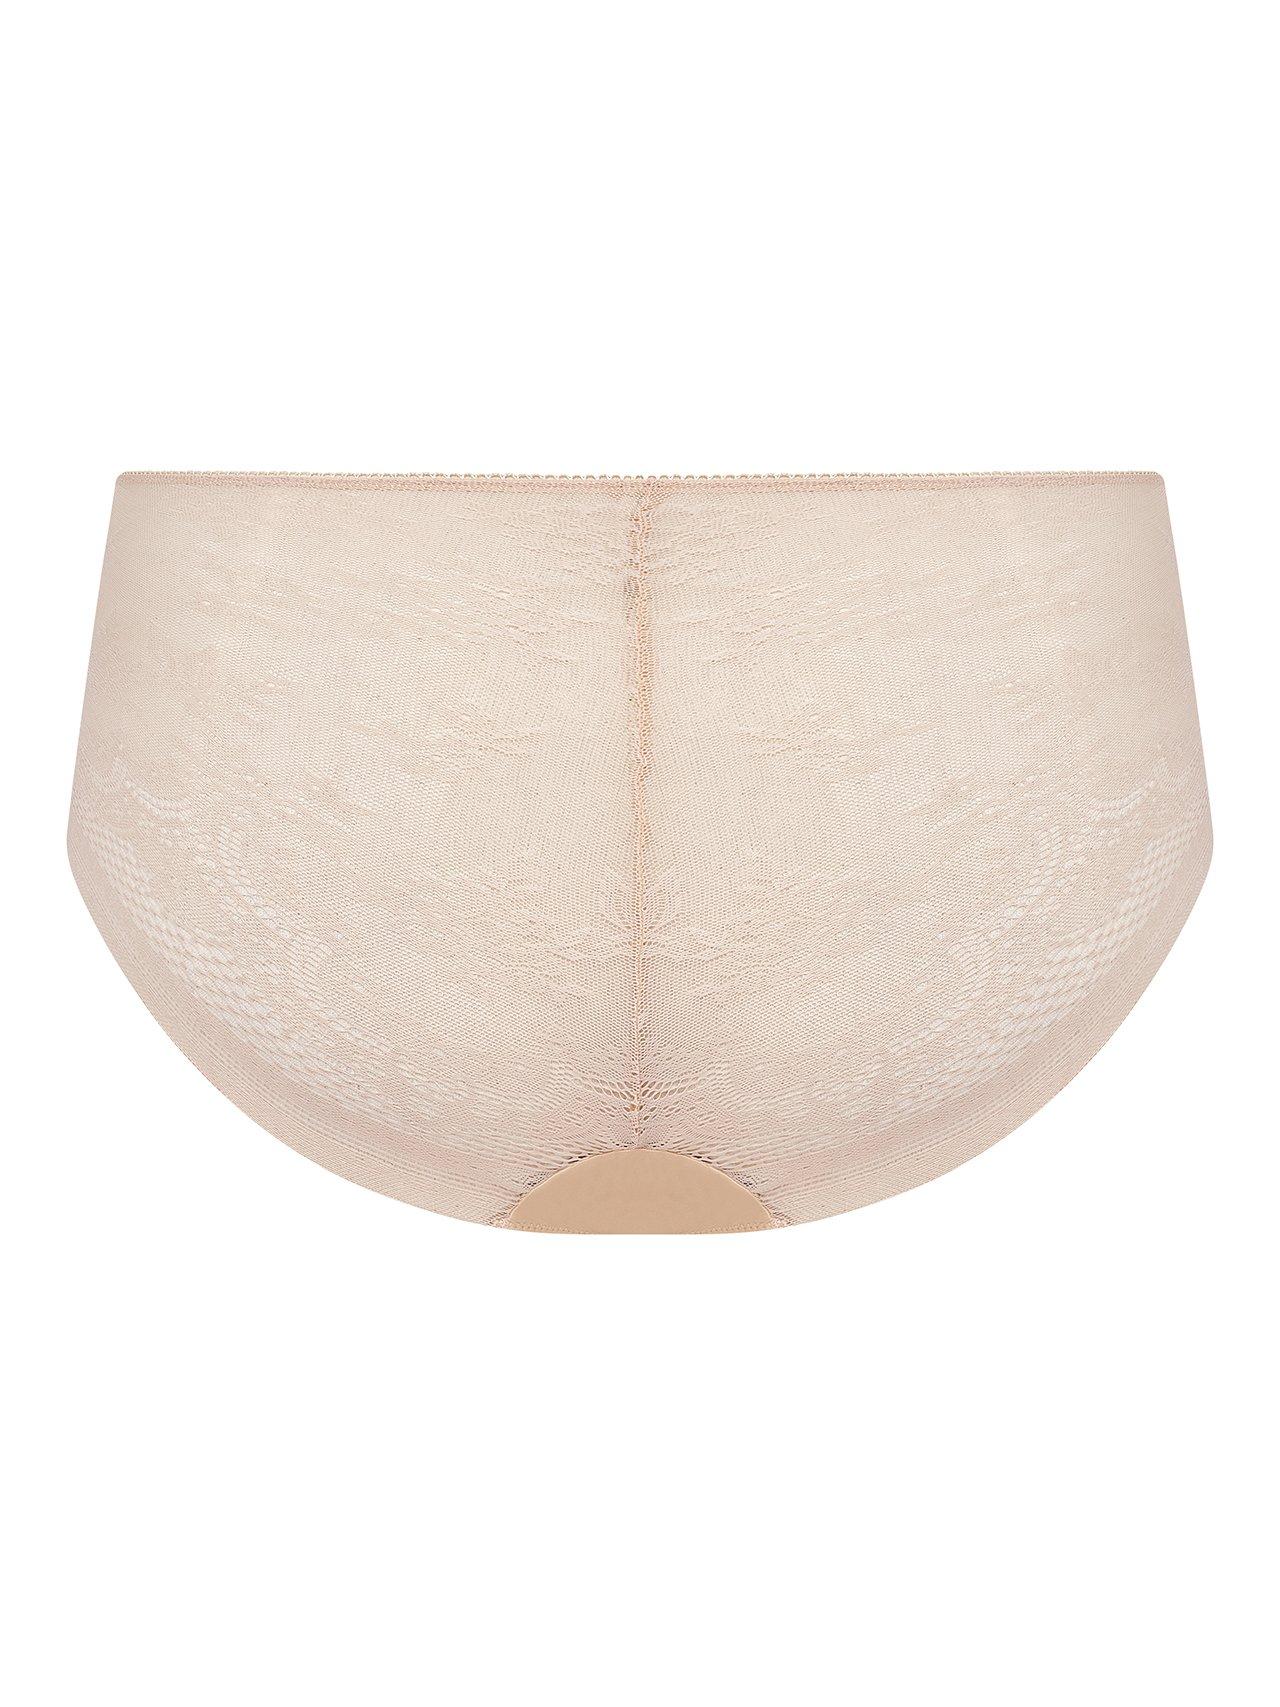 Quần lưng cao - High waist brief - 0301B